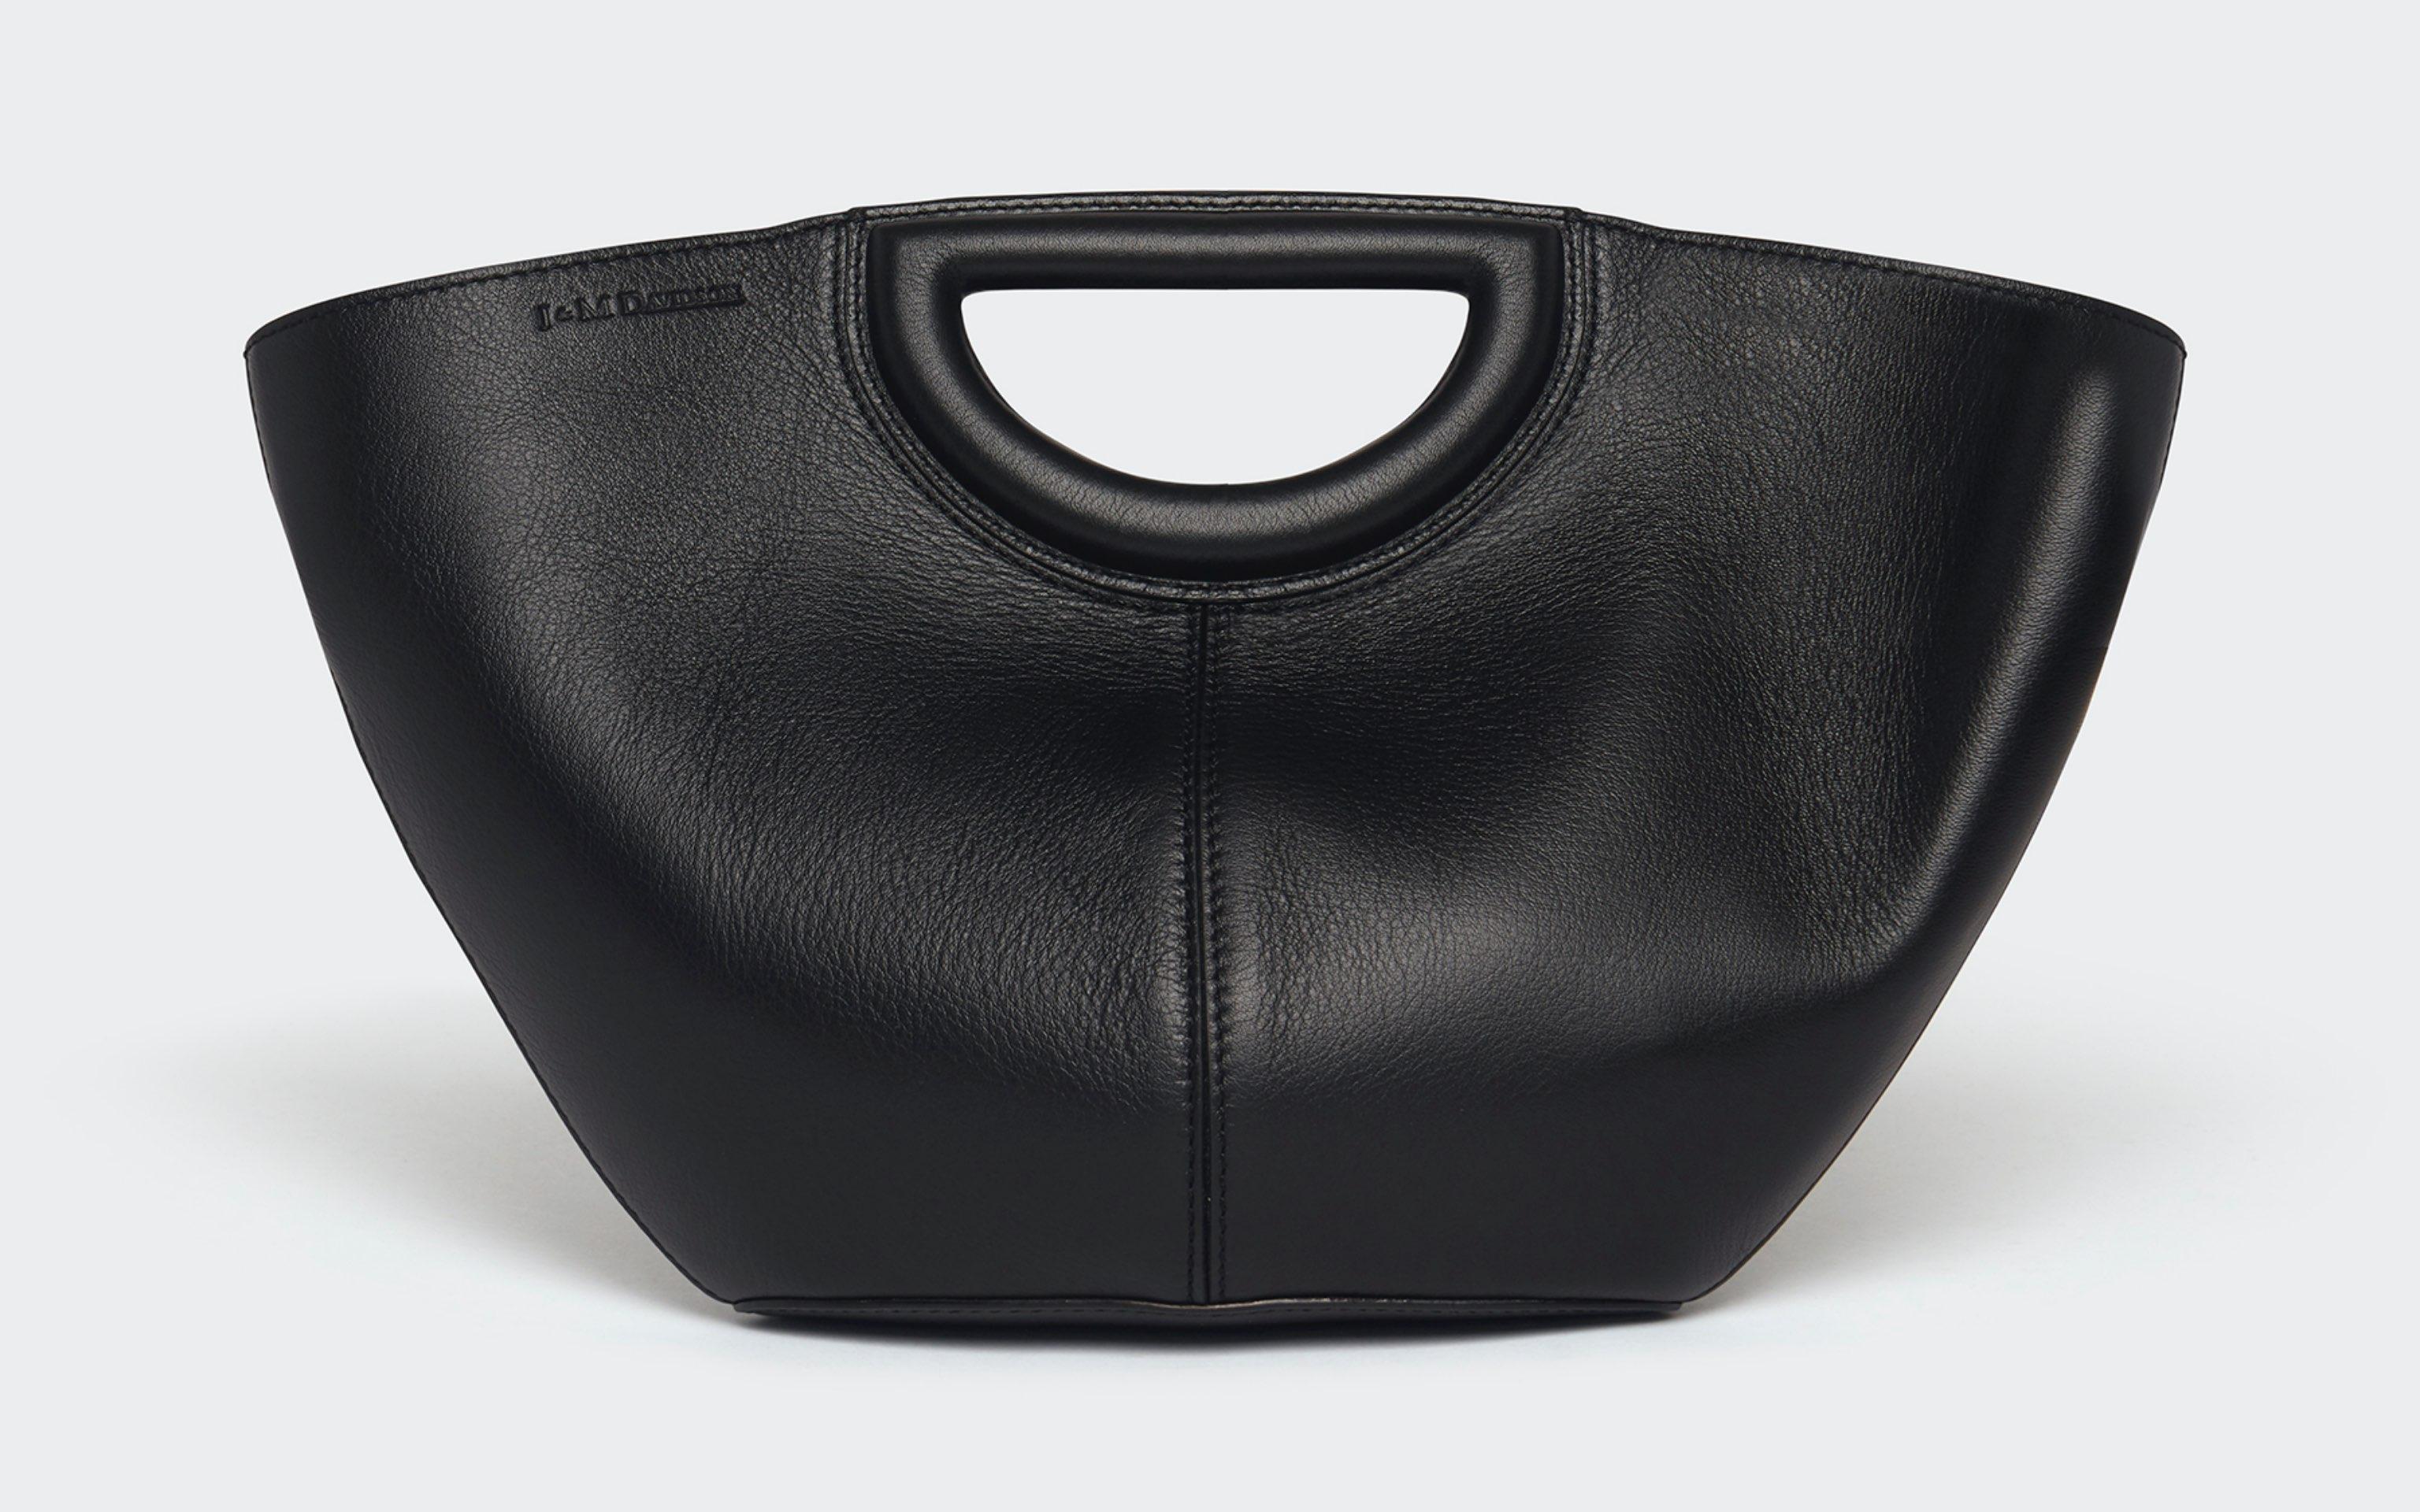 J&M Leather bag in black